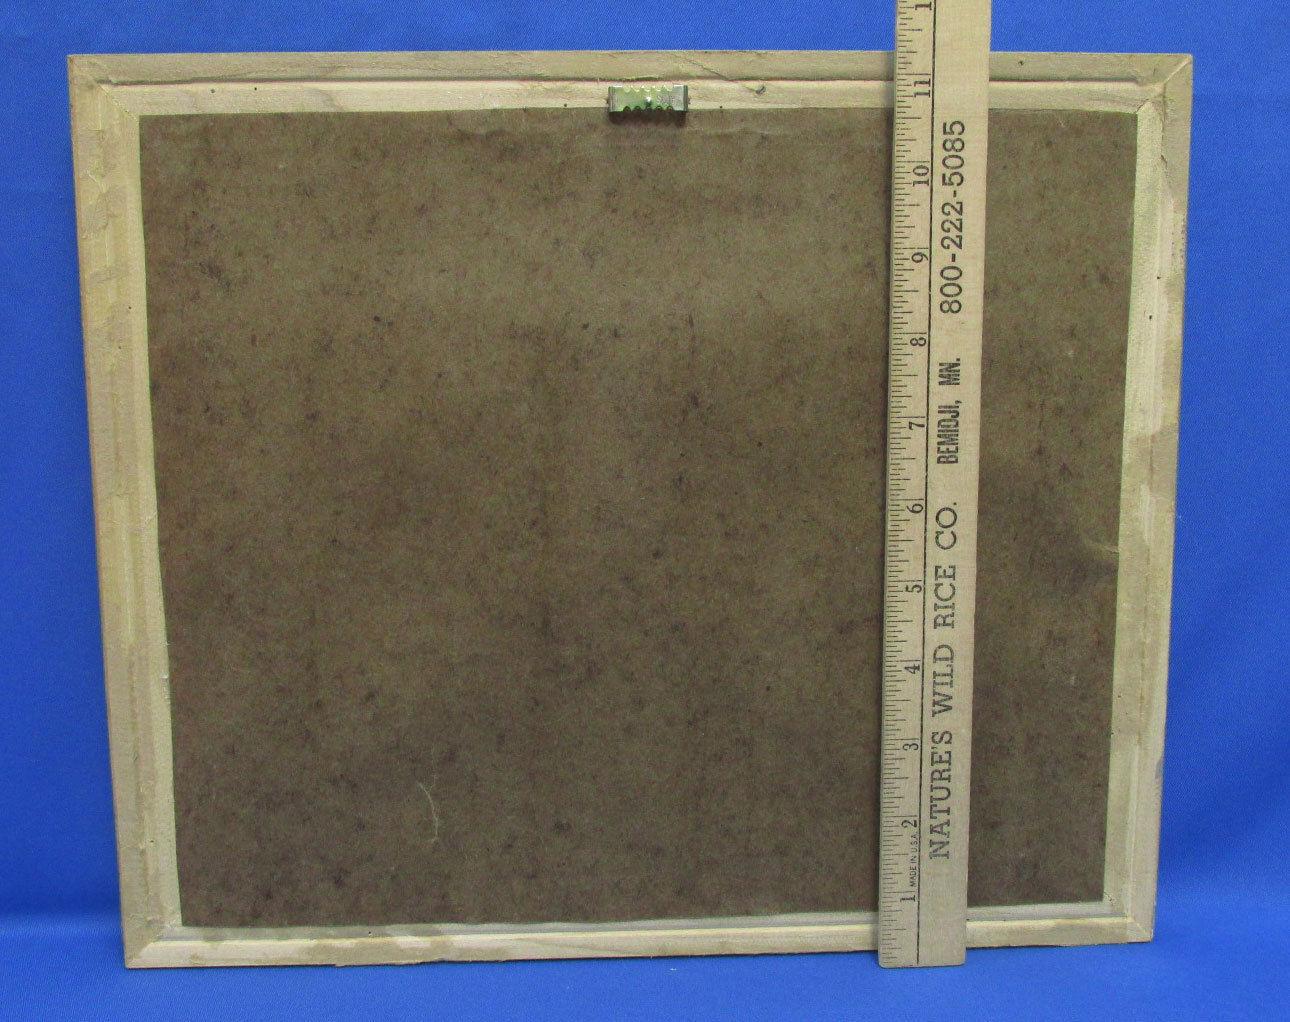 Stone Angel Framed Print Silver Tone Ornate Frame Textured Mat Elegant